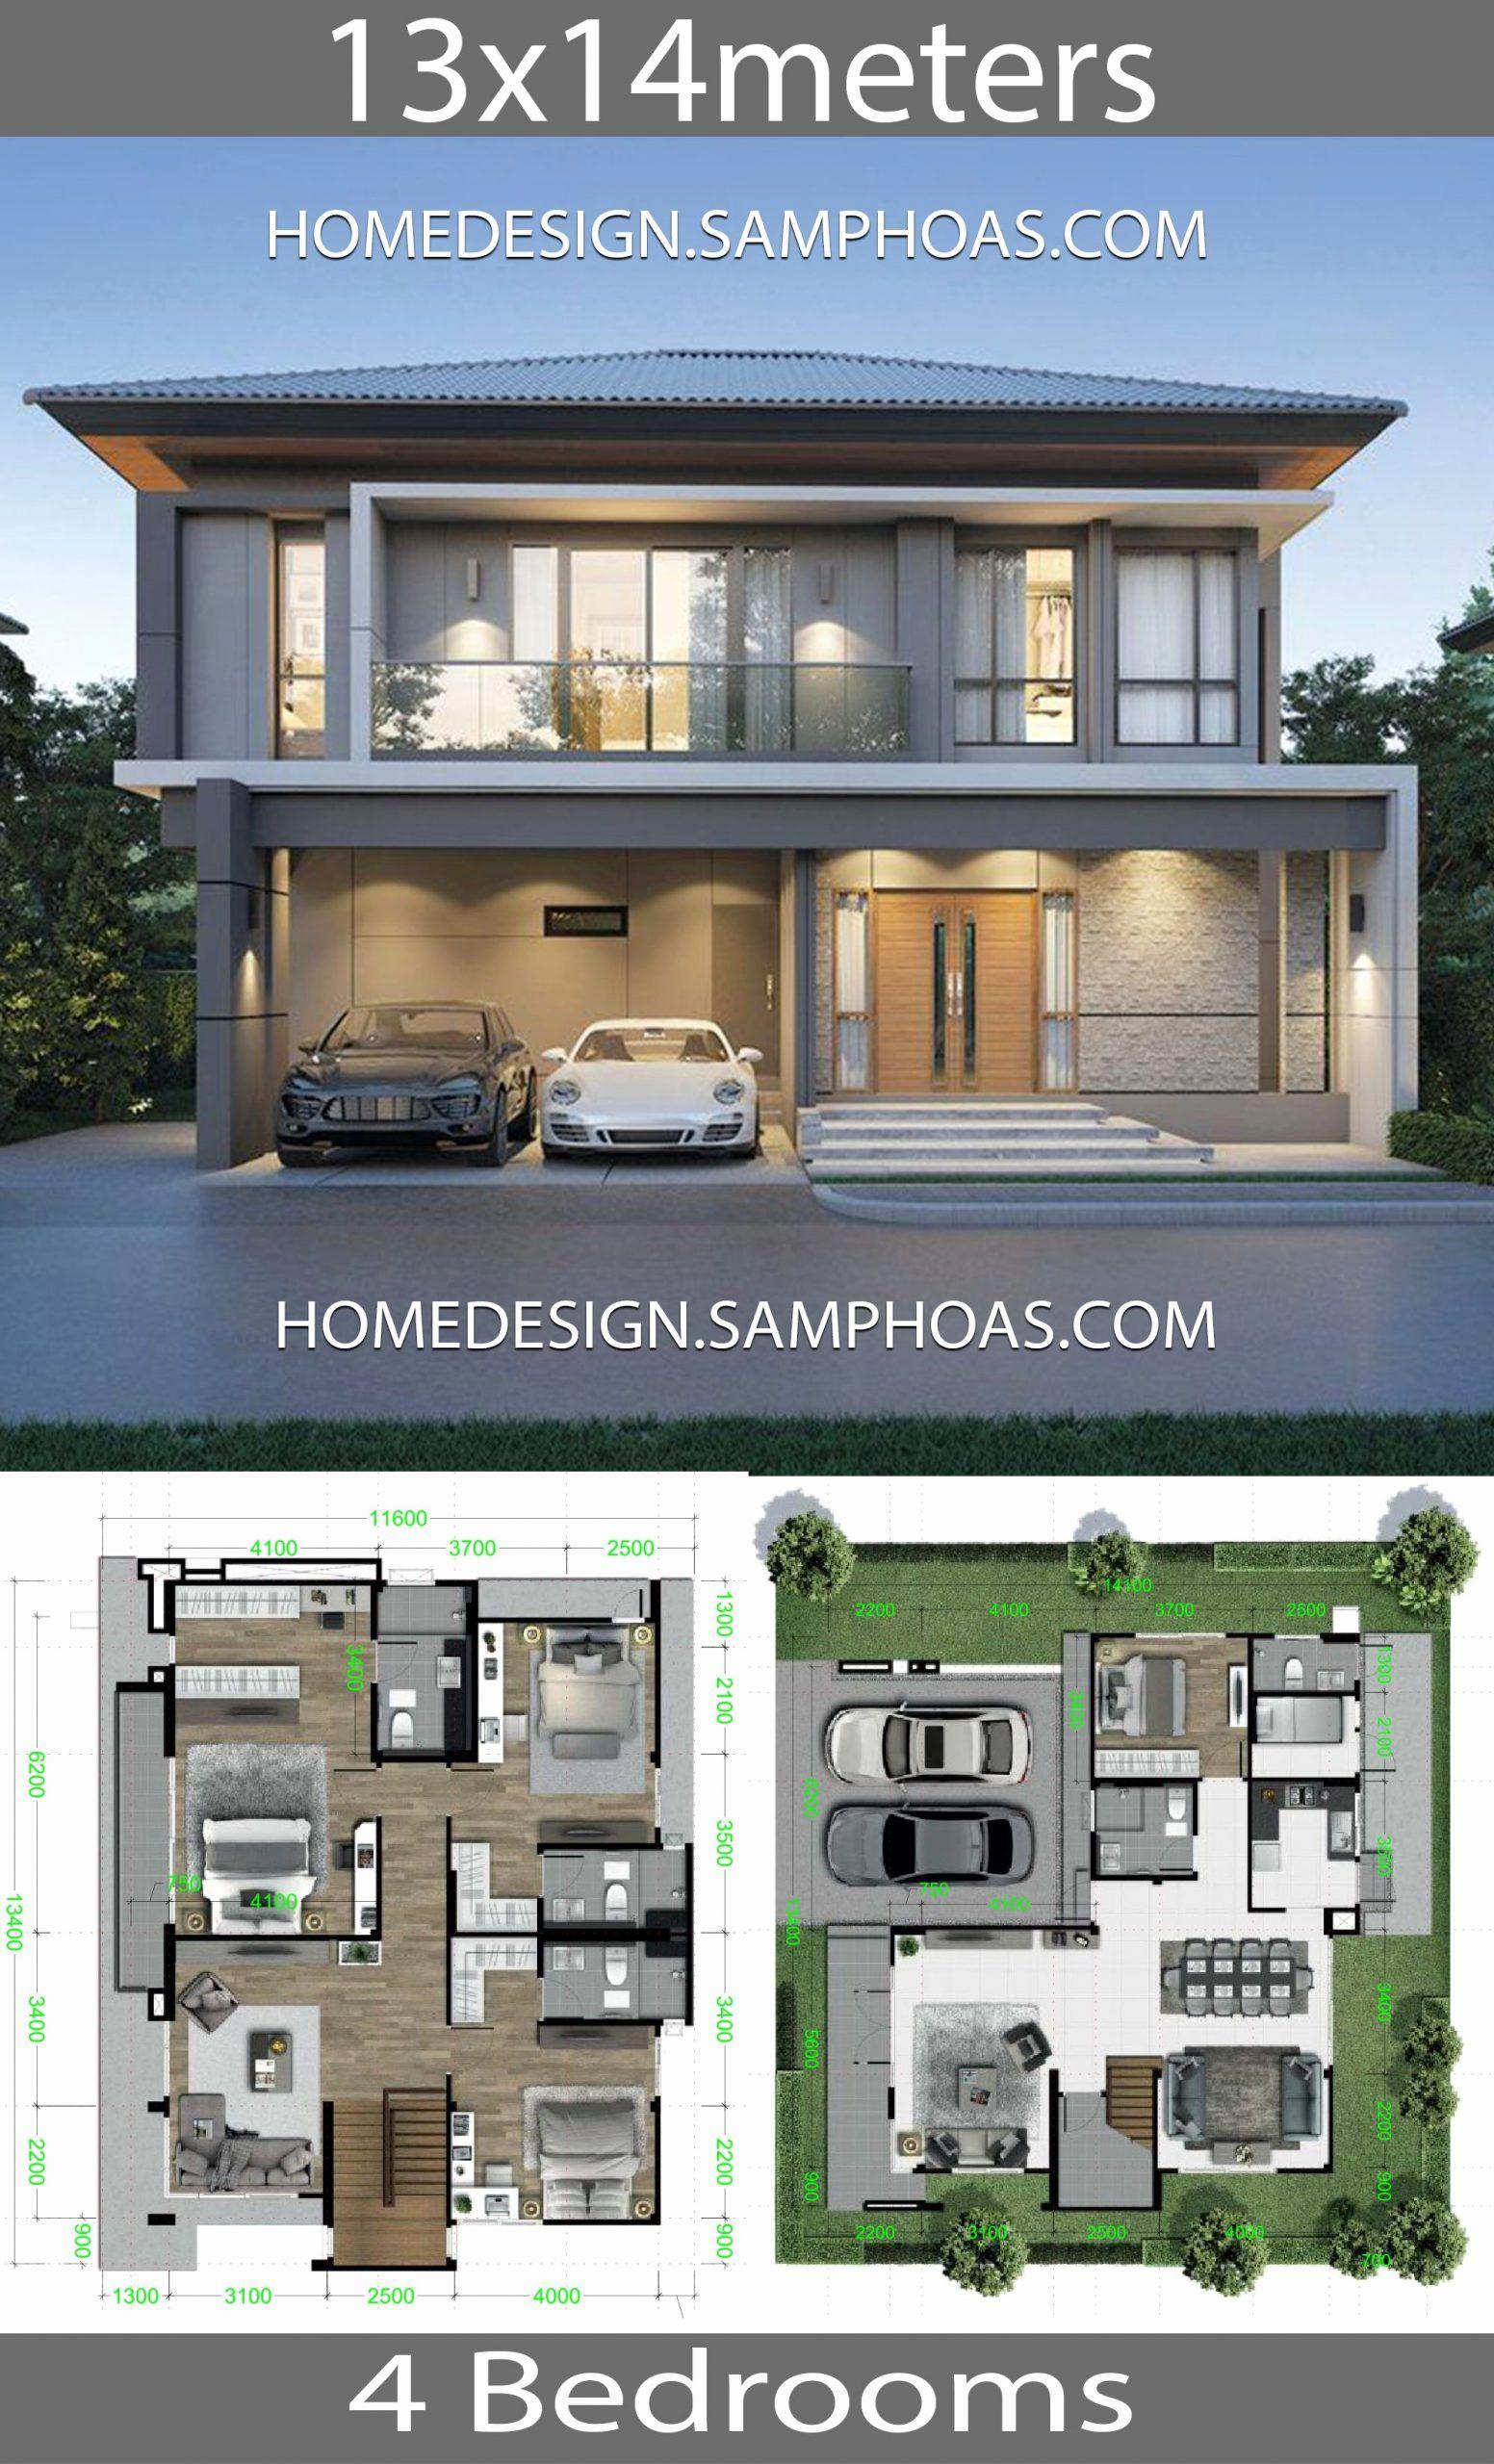 Best 3d Home Design Elegant 10 Best House Design Plans With Floor Plans House Plans 3d Modern House Facades Architectural House Plans Two Story House Design